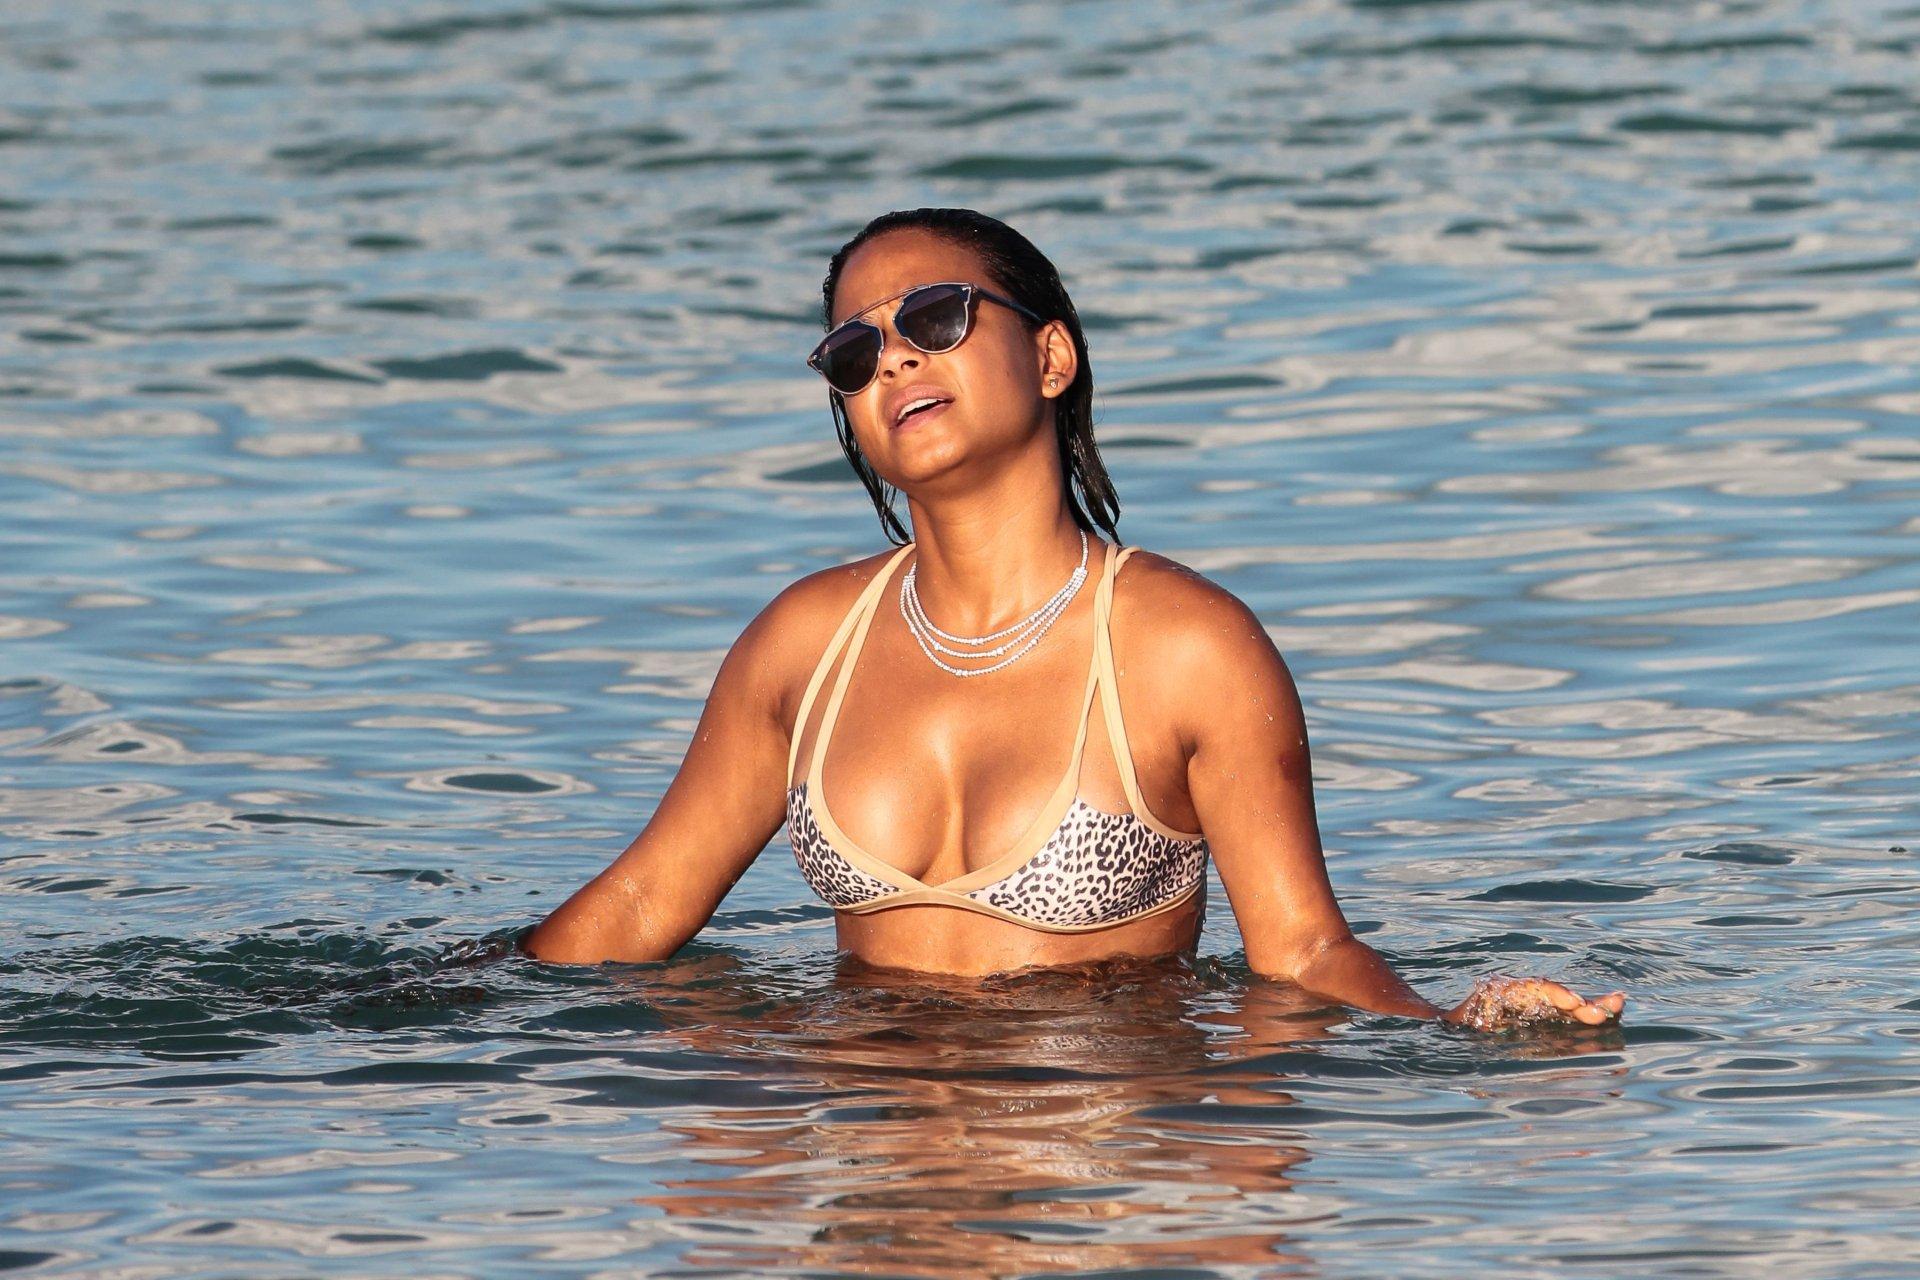 Christina Milian in a Bikini (38 Photos)